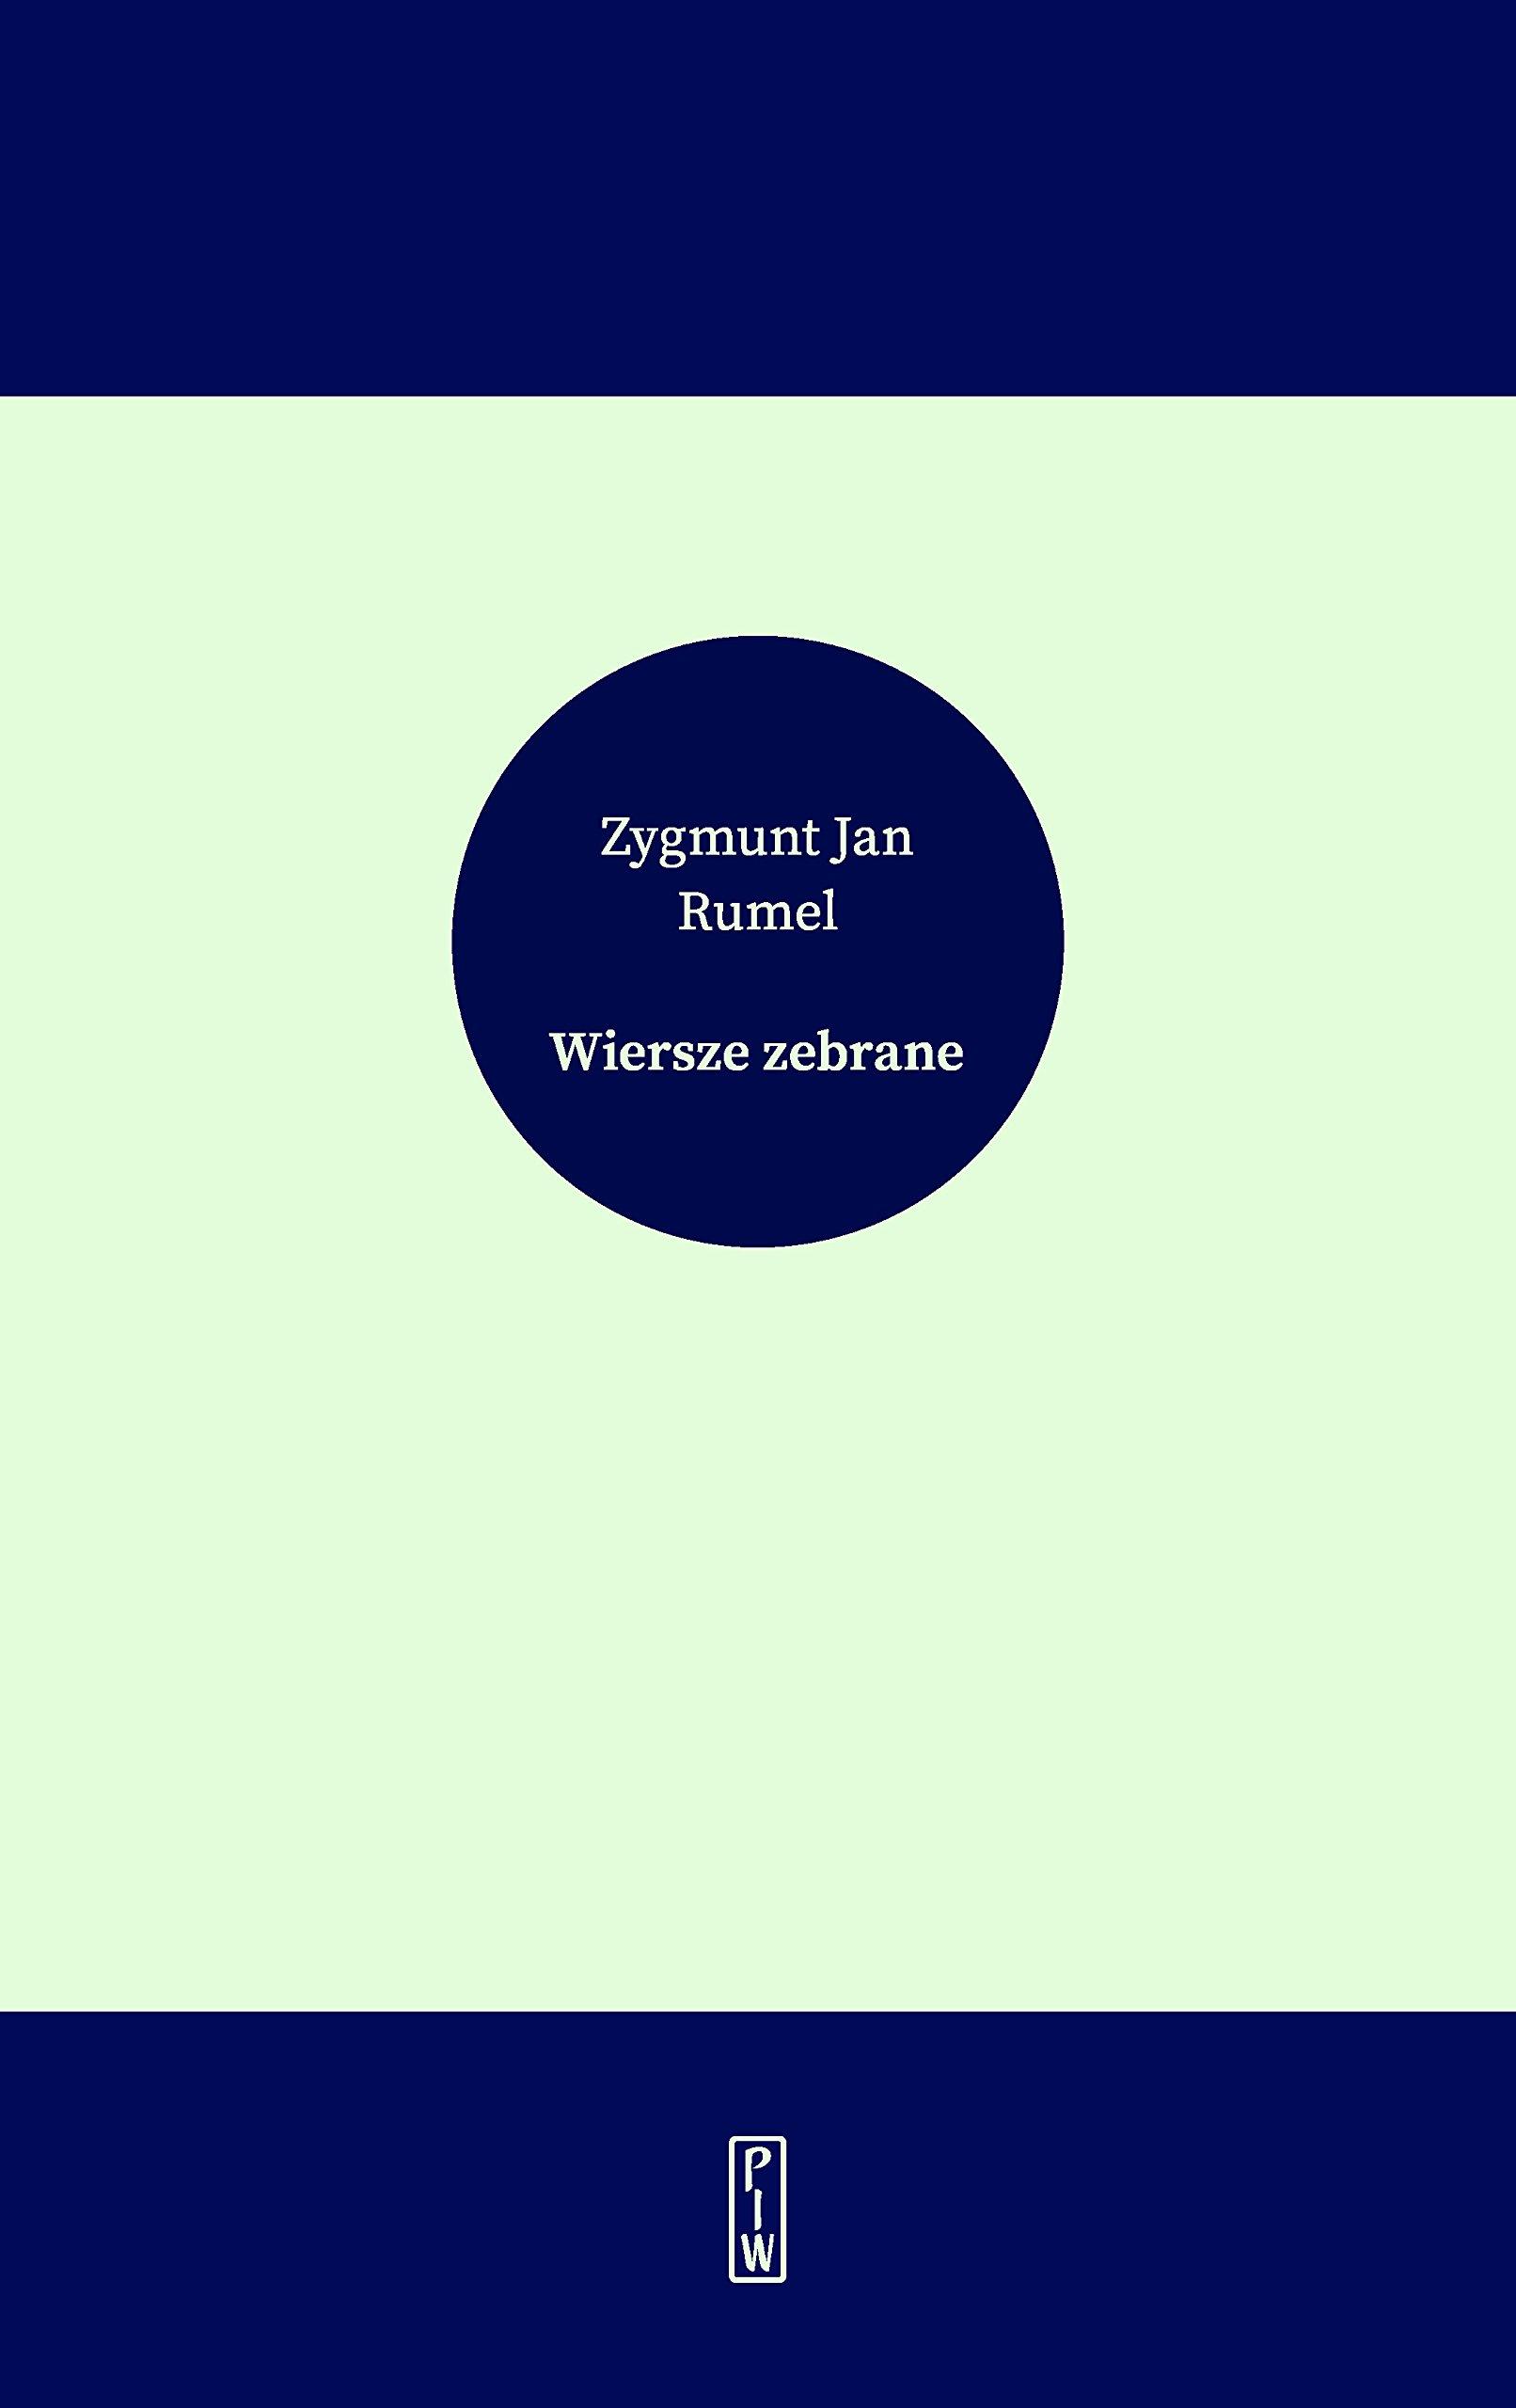 Wiersze Zebrane Amazones Zygmunt Jan Rumel Libros En